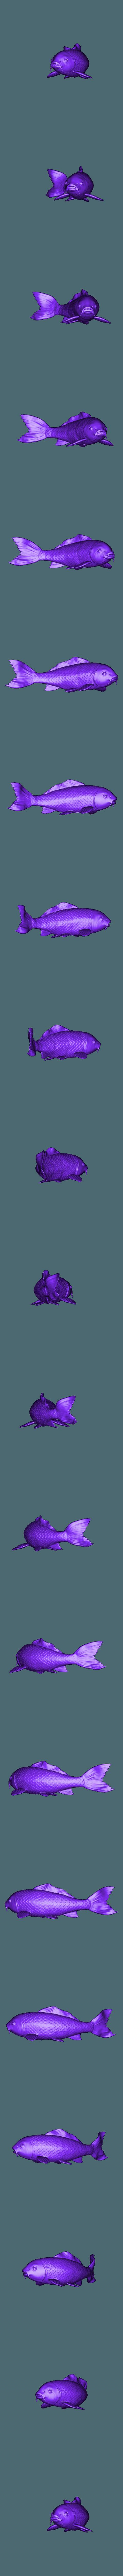 Carp_3.stl Download OBJ file Carp Fancy • Object to 3D print, Dynastinae